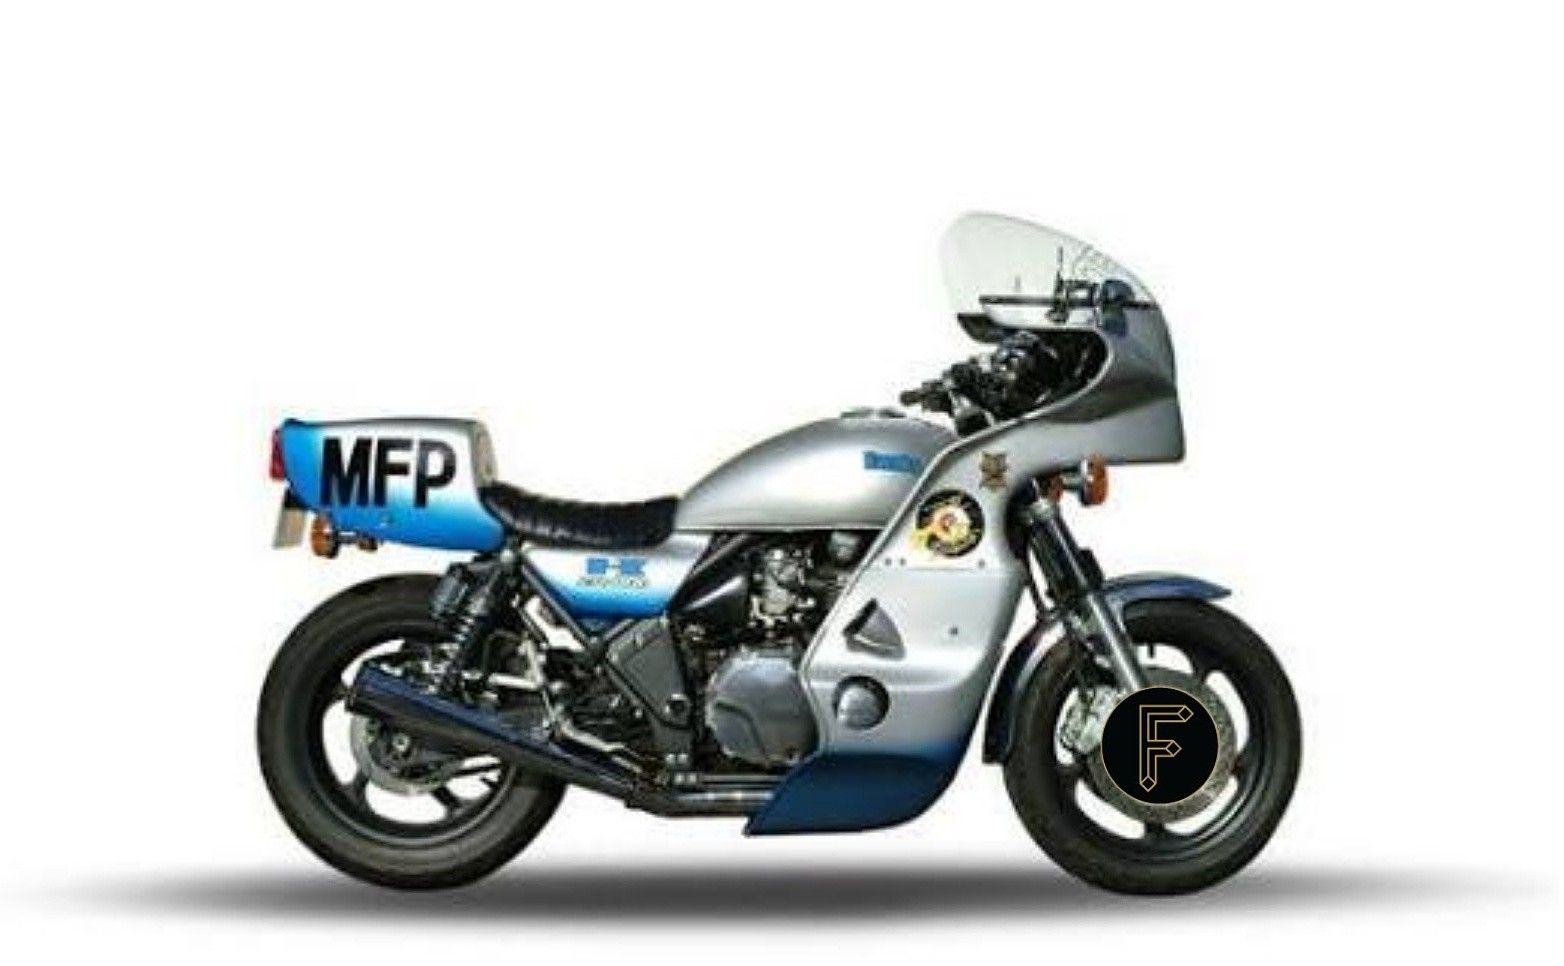 moto legends the most iconic motorcycles from fiction 1977 kawasaki kz1000p mad max 1979 firemotorcycle motolegend kawasaki  [ 1564 x 966 Pixel ]